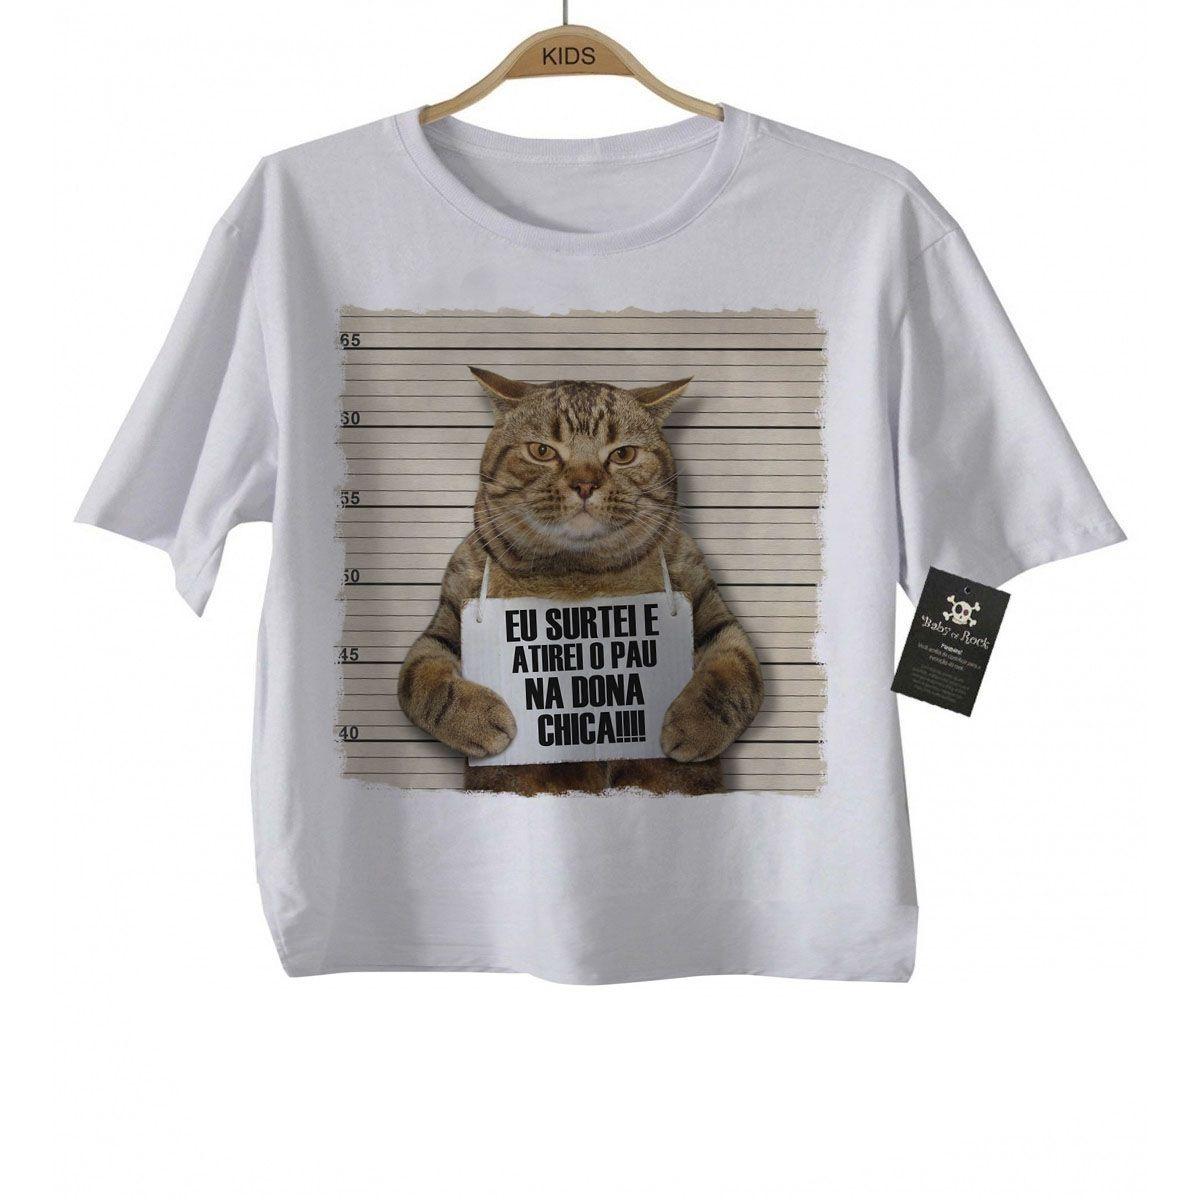 Camiseta  Bad Cat  - Atirei o Pau na dona Chica - White  - Baby Monster S/A